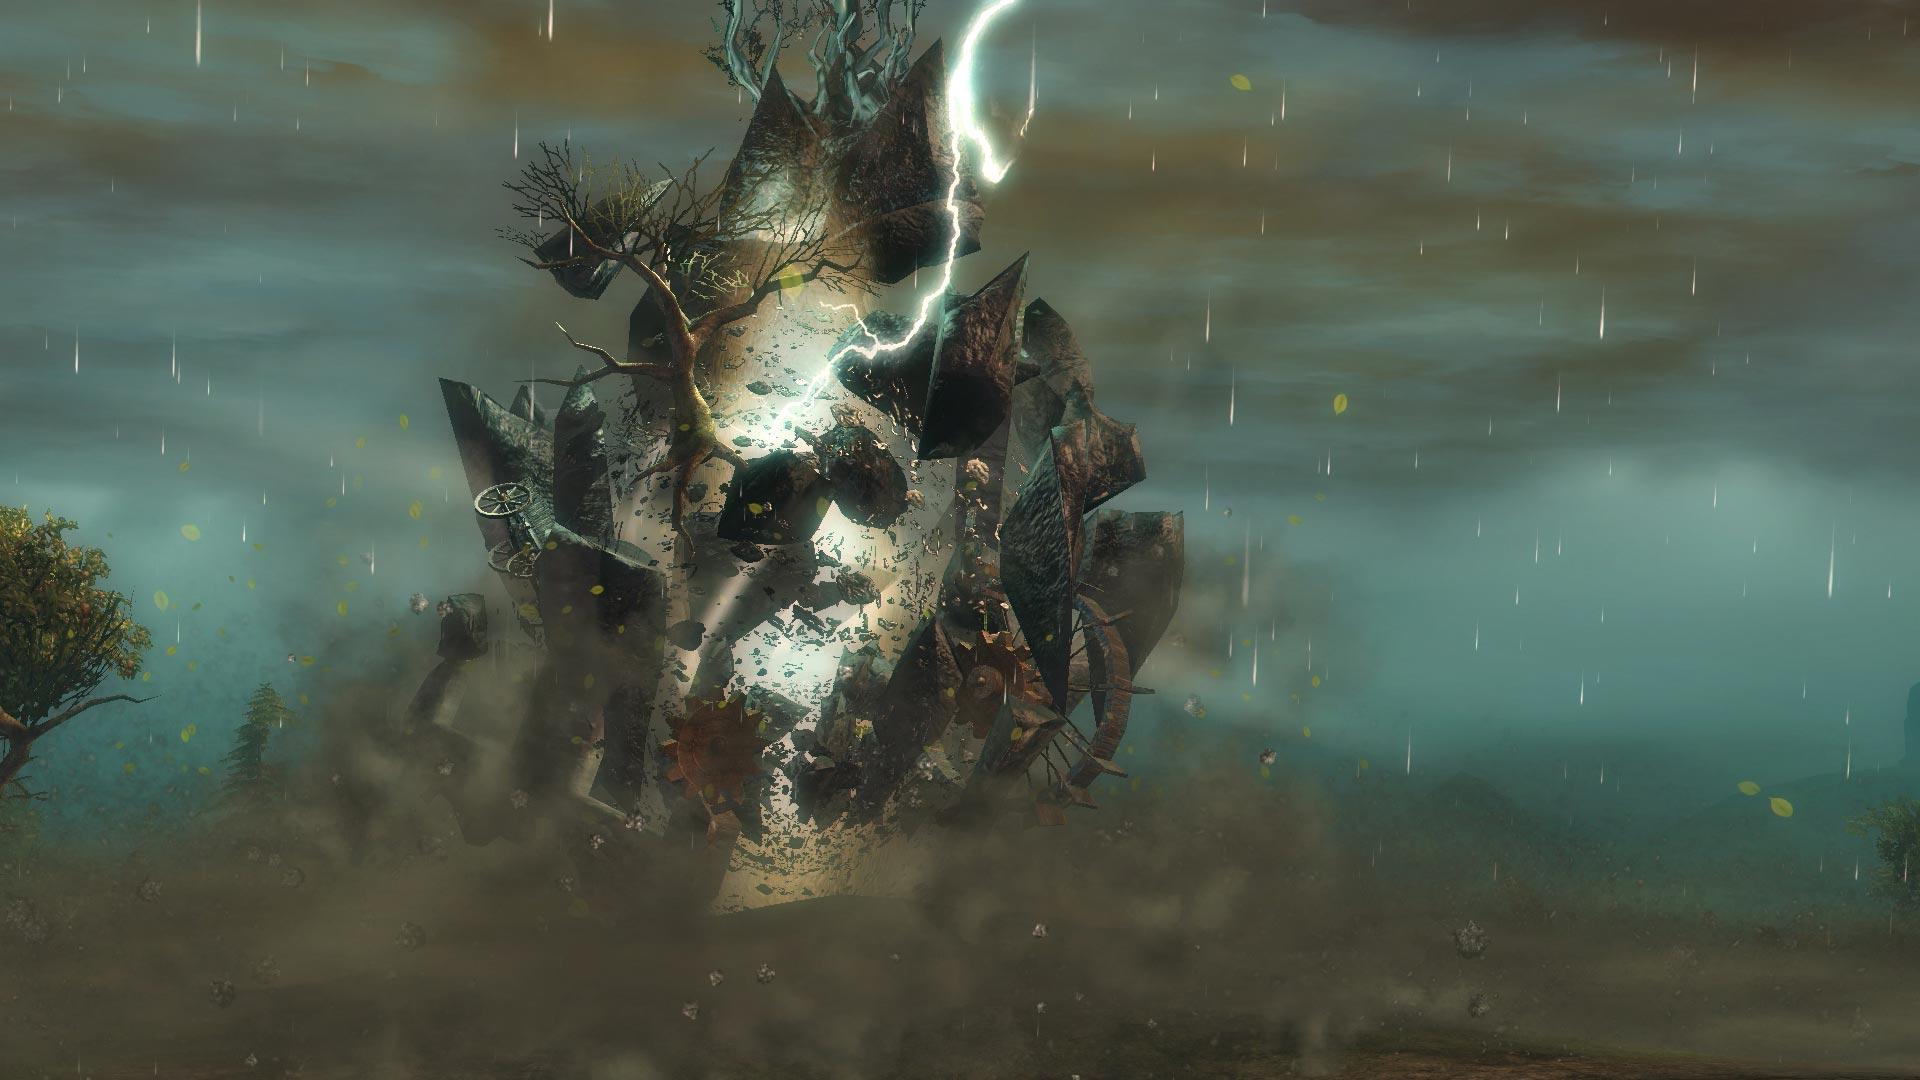 Guild Wars 2 Key (Digital Deluxe Edition) Screenshot 11.